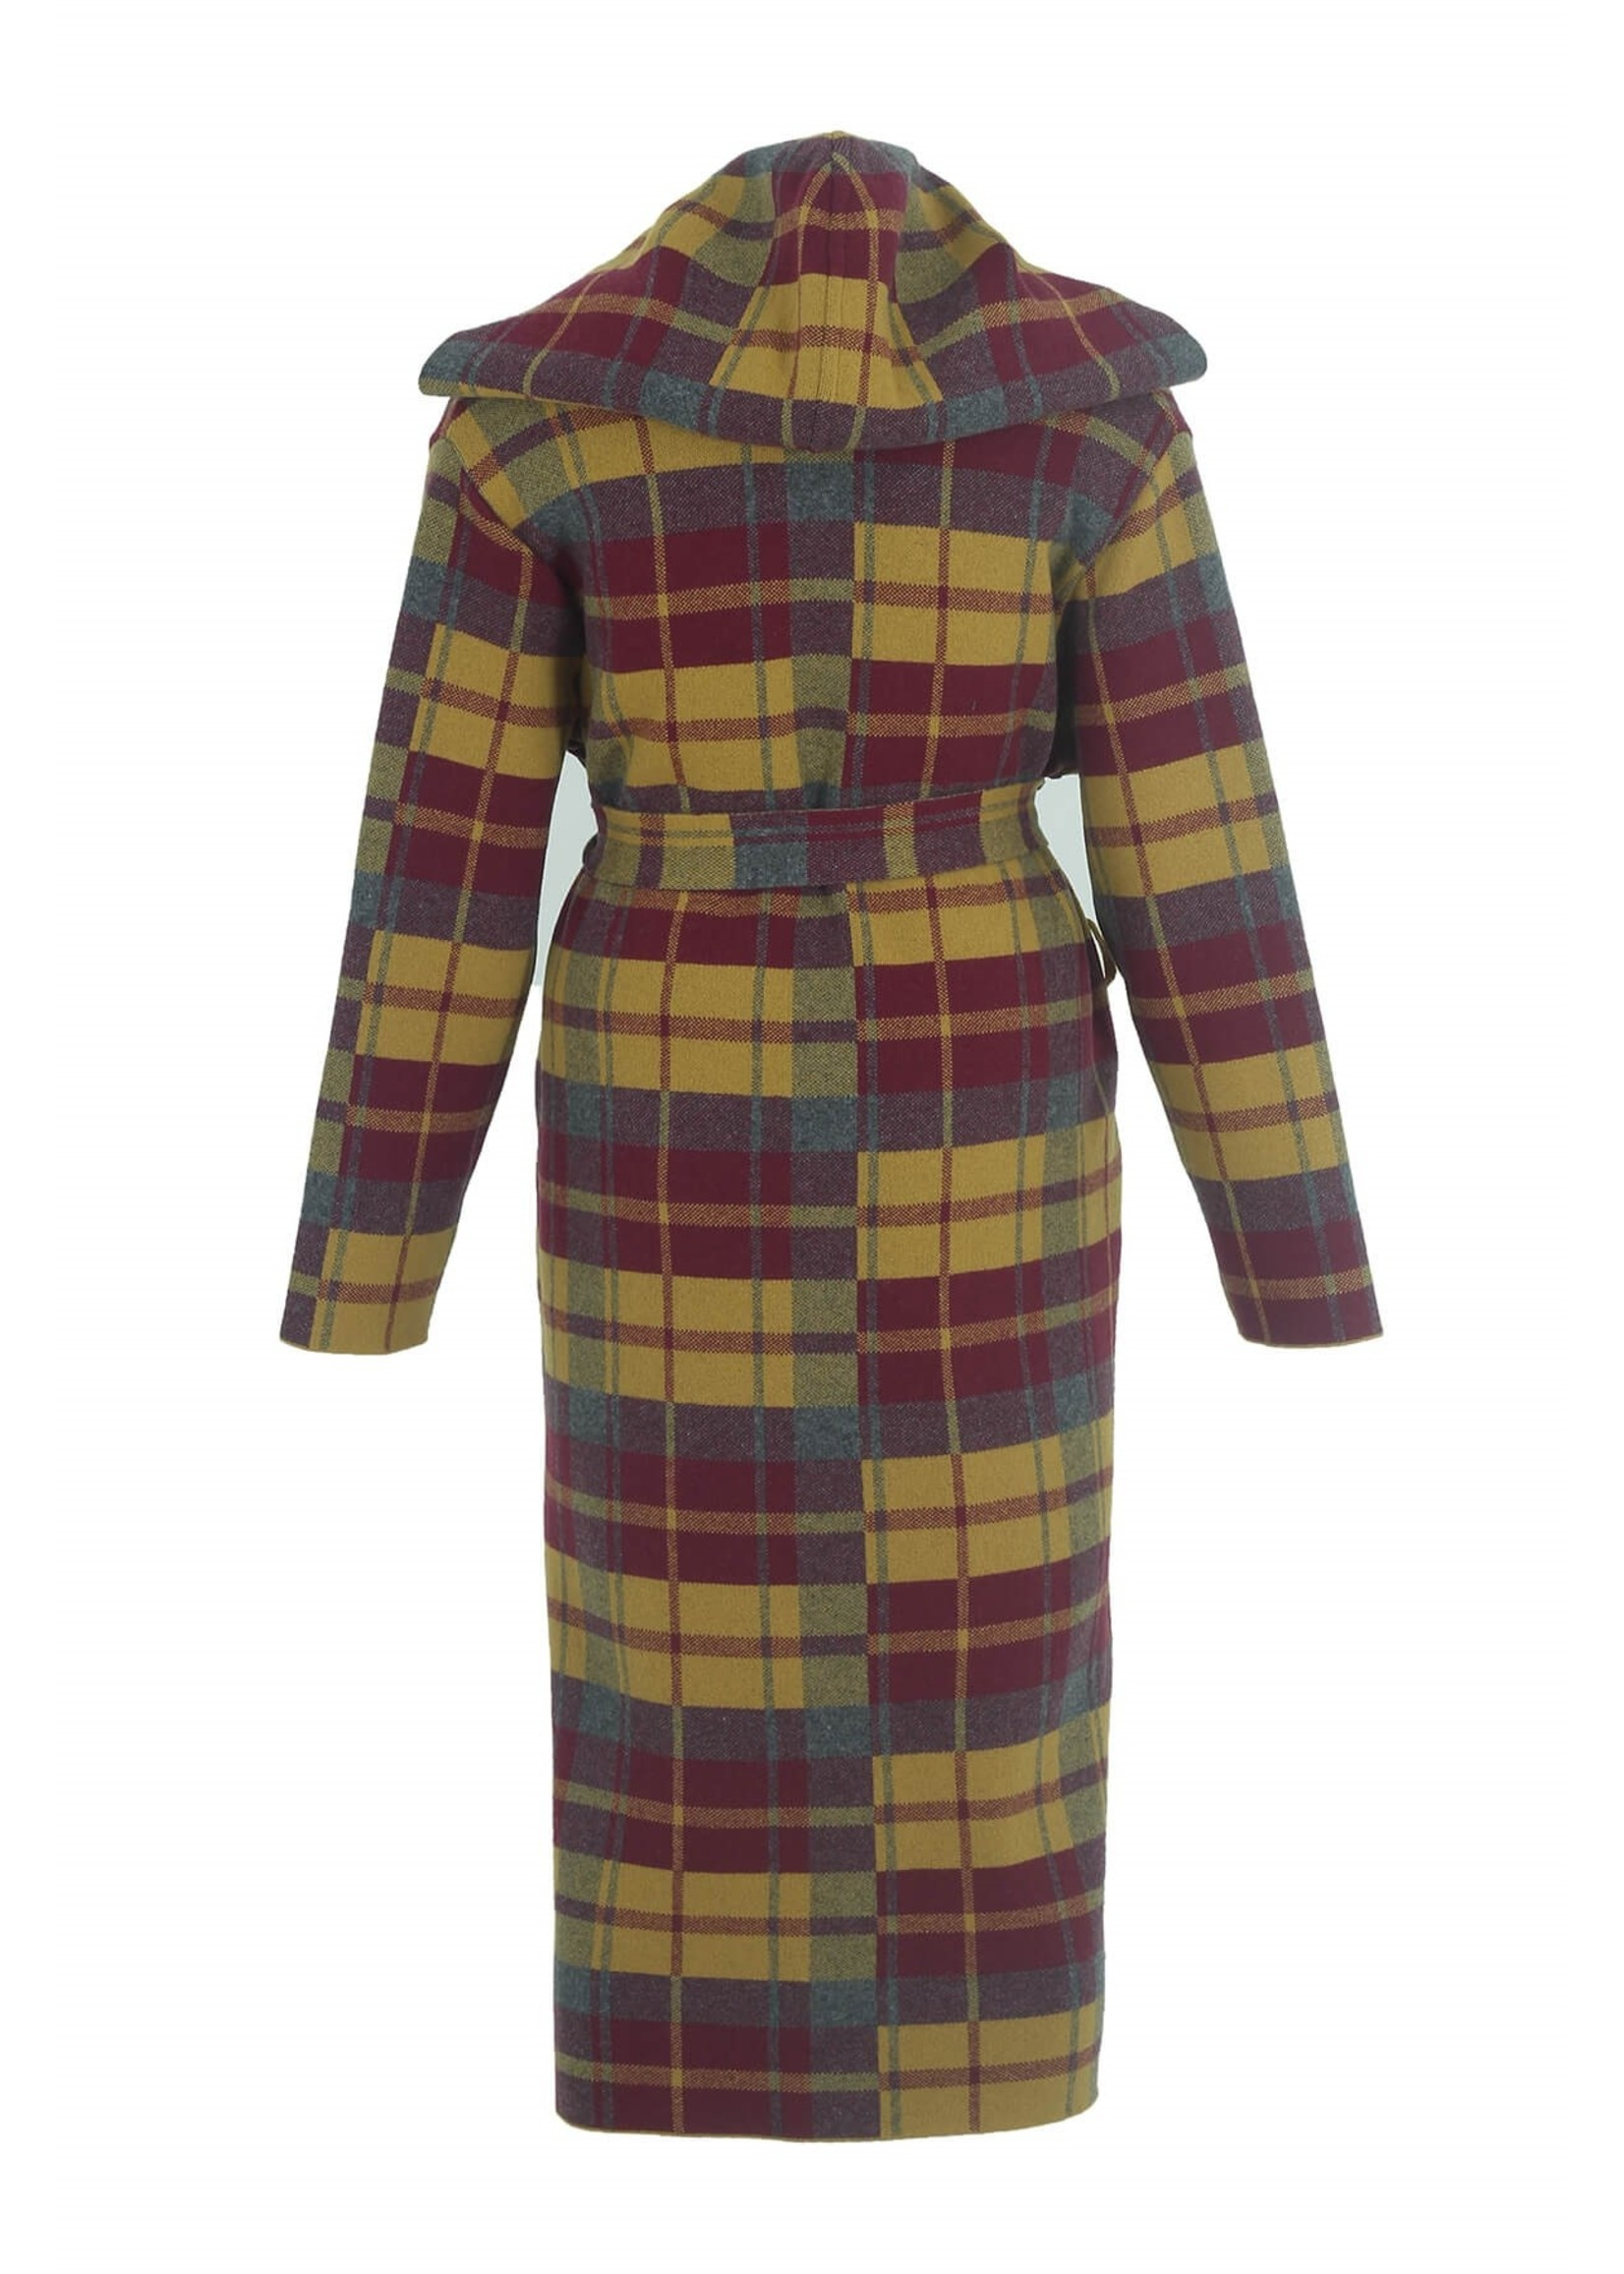 STEPPINOUT b13979 long plaid fall coat